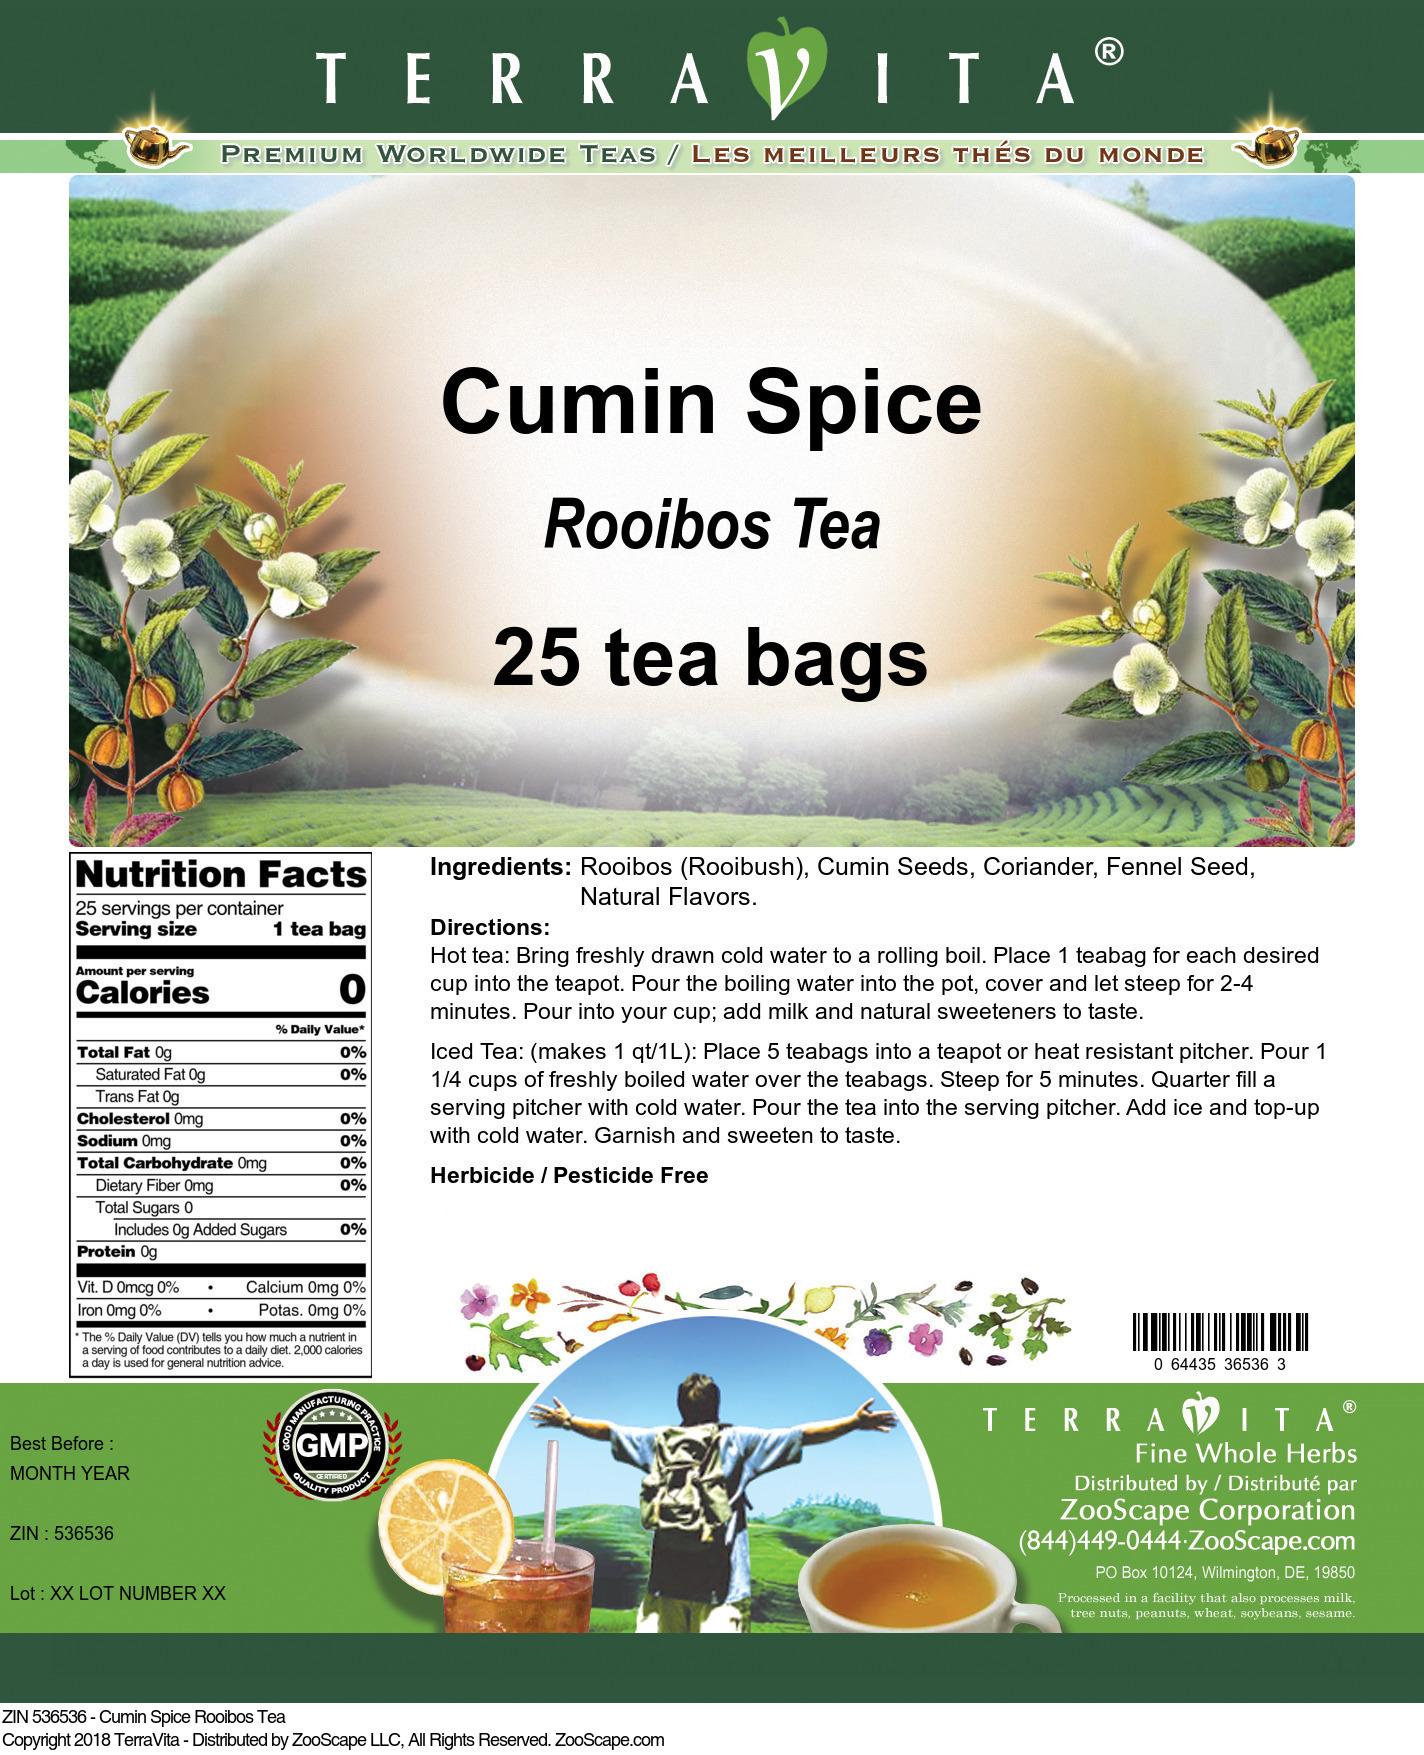 Cumin Spice Rooibos Tea